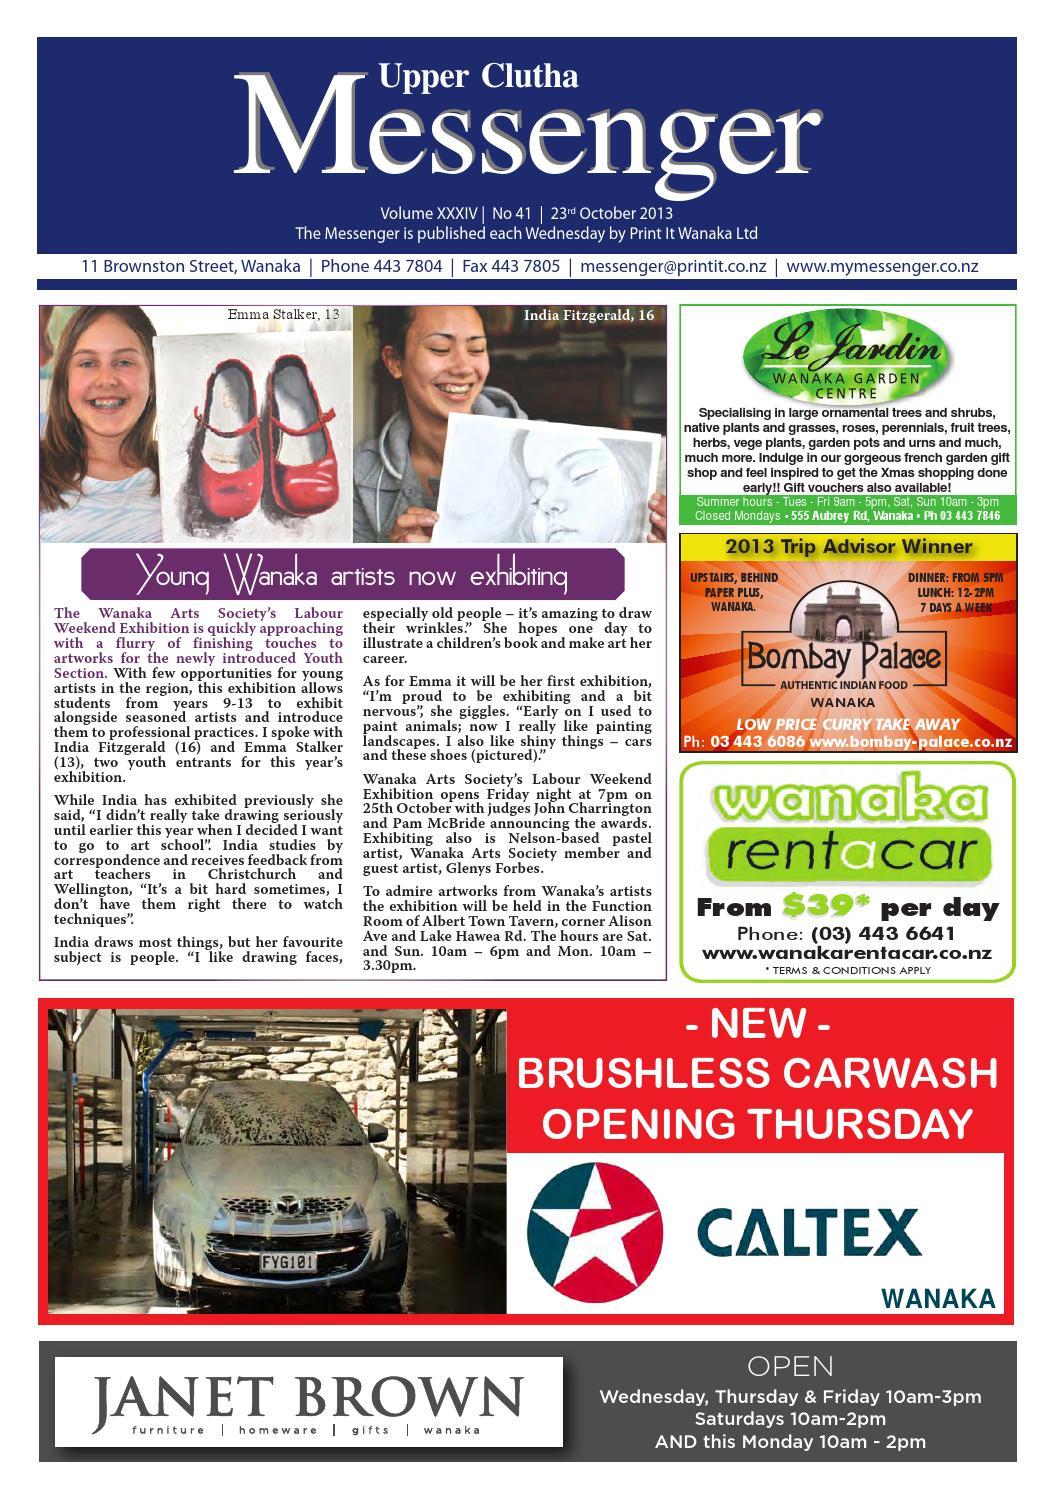 02bf89402a9 Upper clutha messenger 23rd october 2013 by Print It Wanaka Ltd - issuu